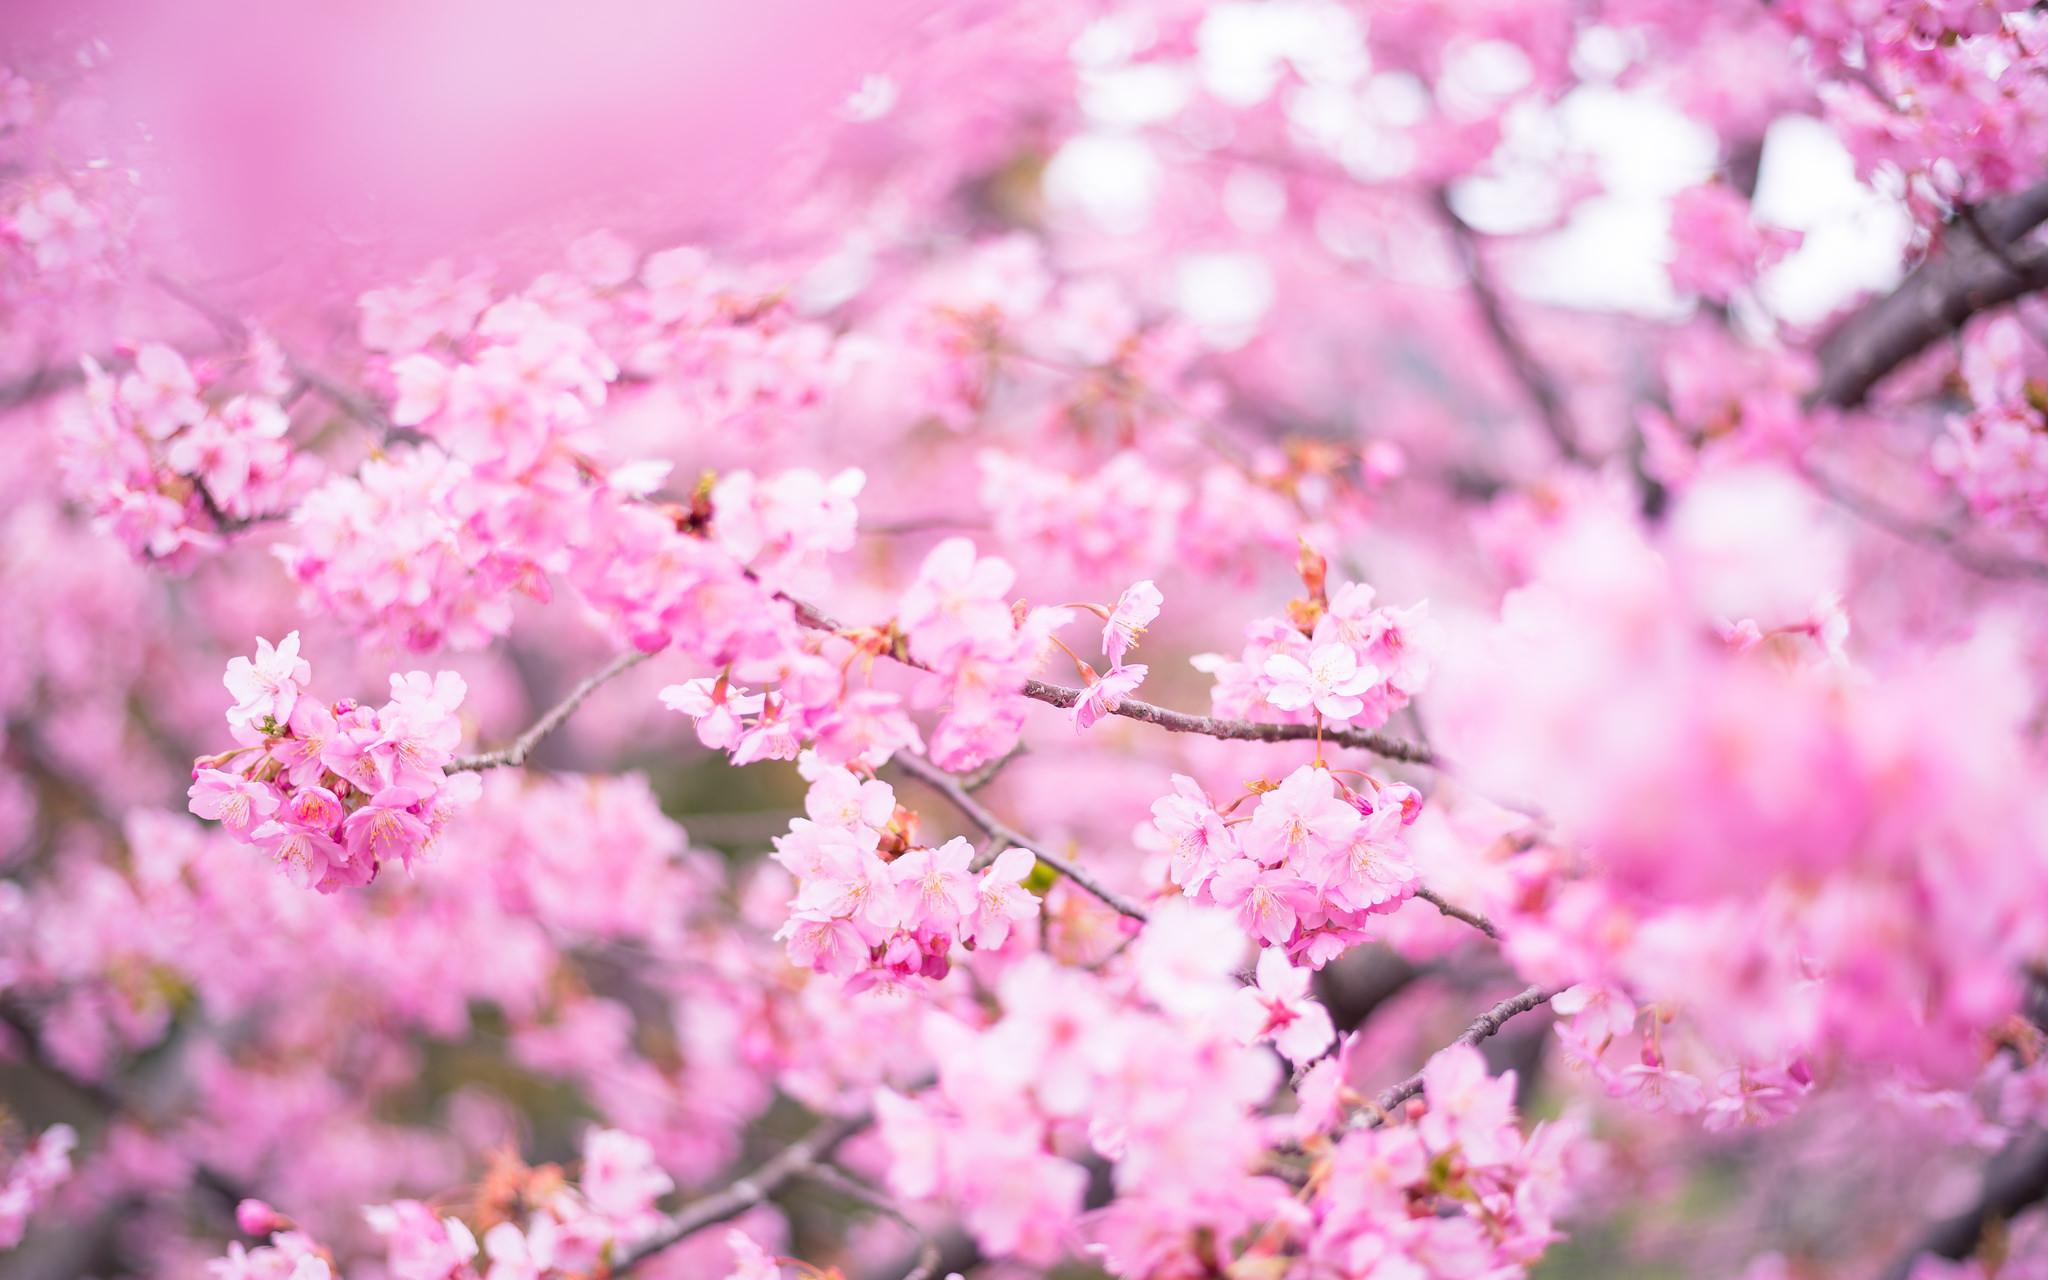 cherry blossom festival 2020 - HD2048×1280